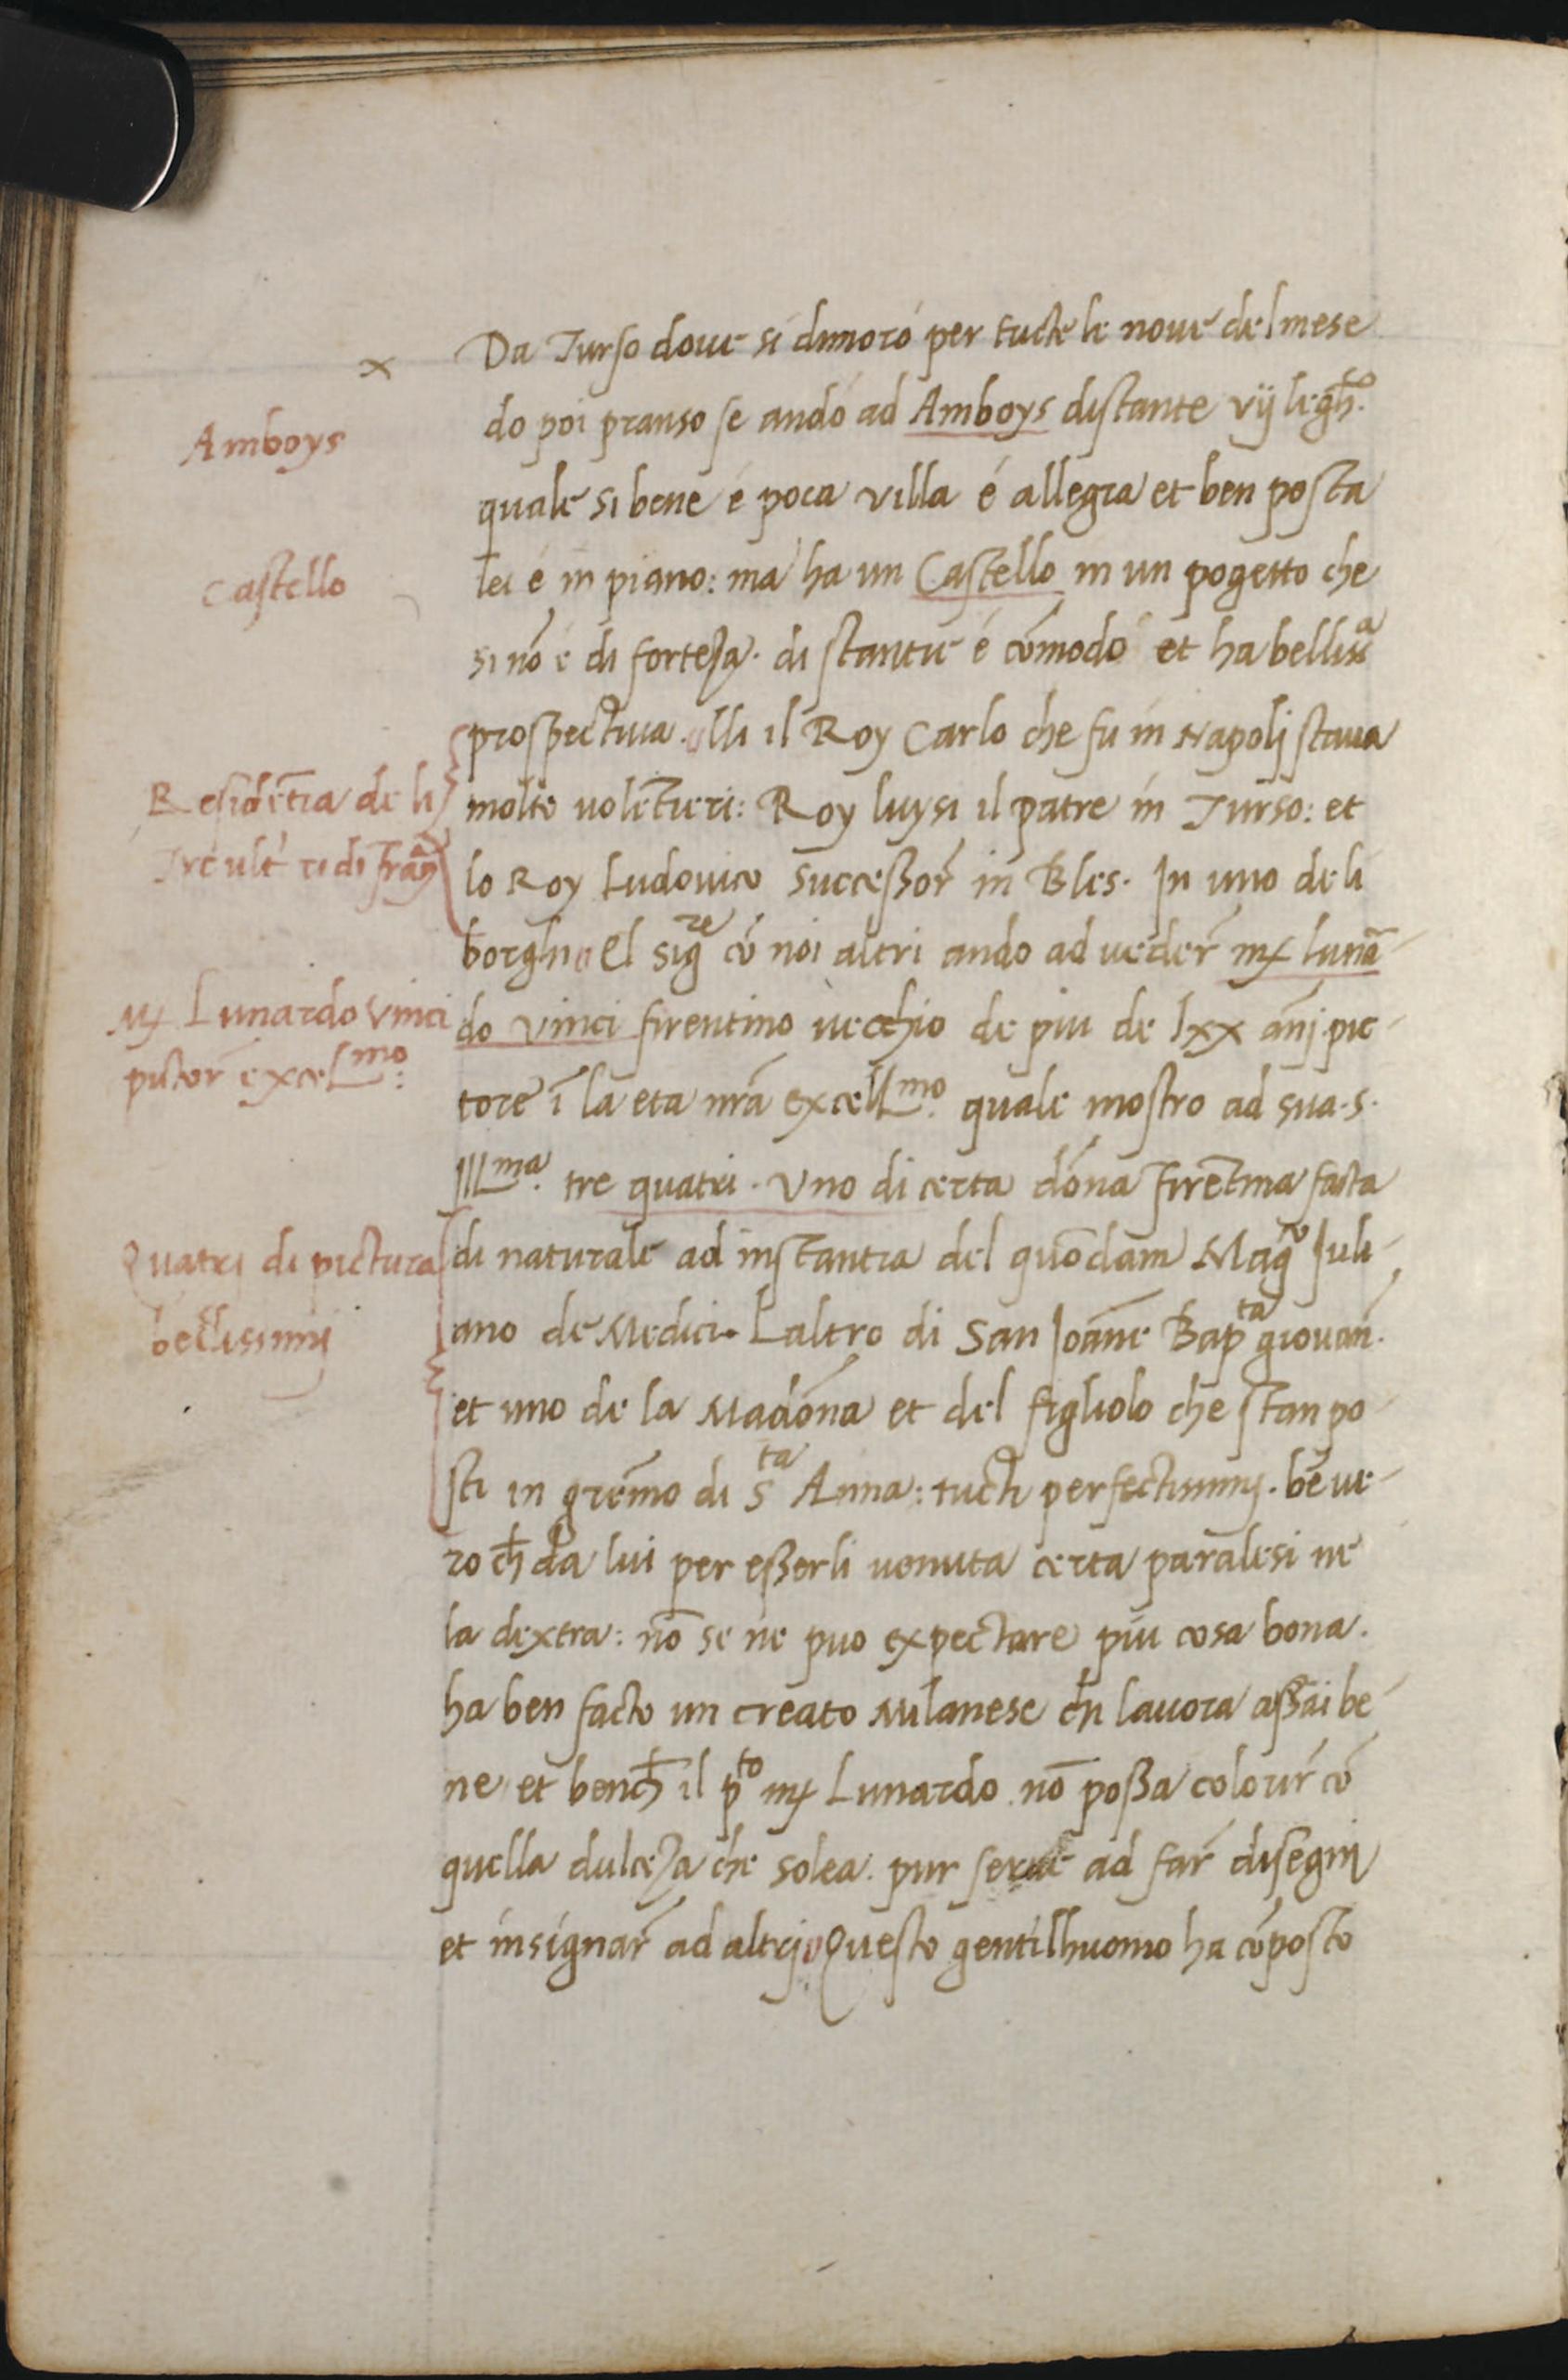 Antonio de Beatis - Account of the visit to Leonardo da Vinci - October 10 1517